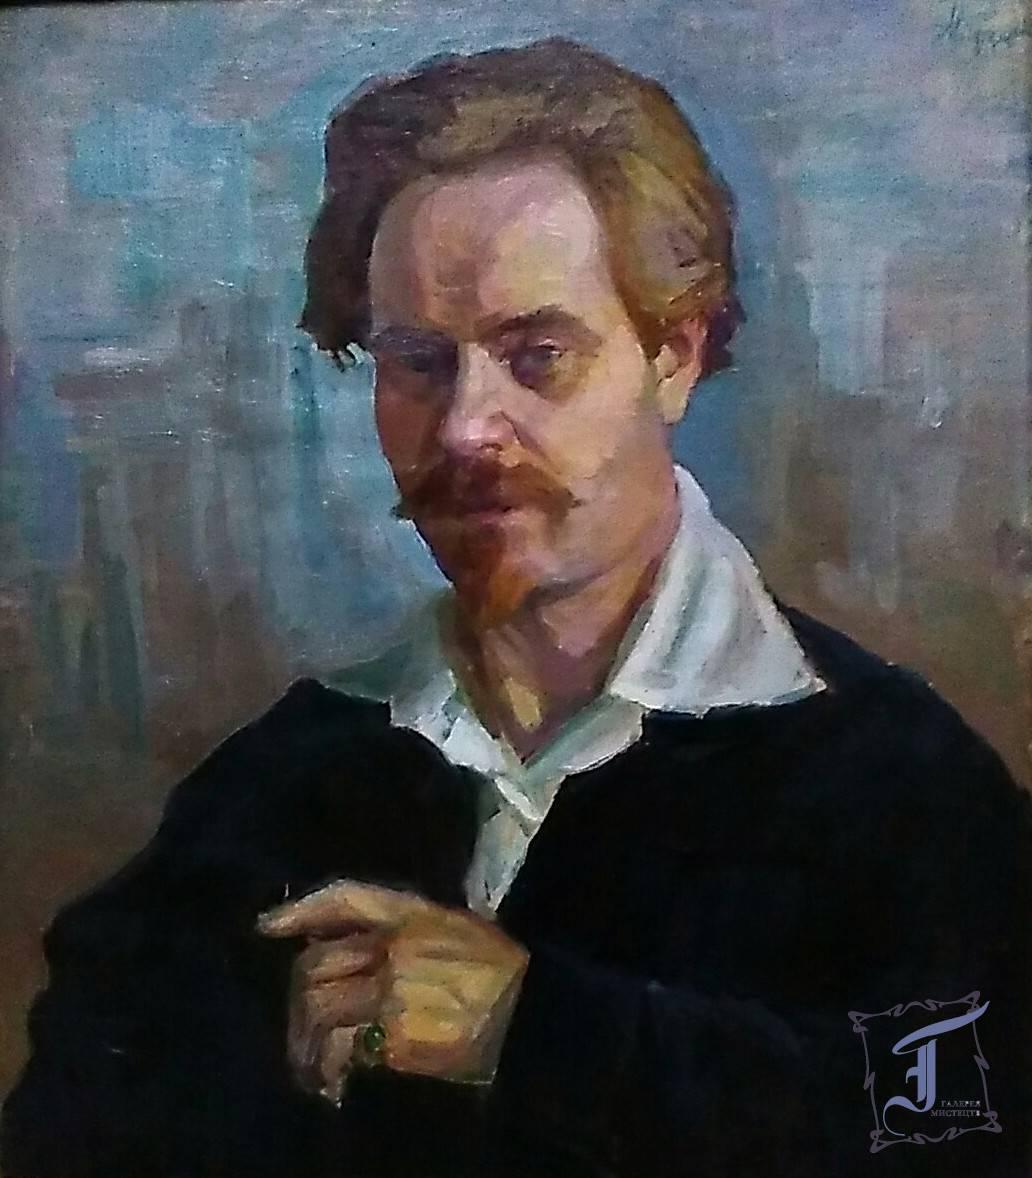 Брукман М. Б. (1884-1929). Портрет художника М.О. Донцова (1877-1974). 1925. Полотно, олія